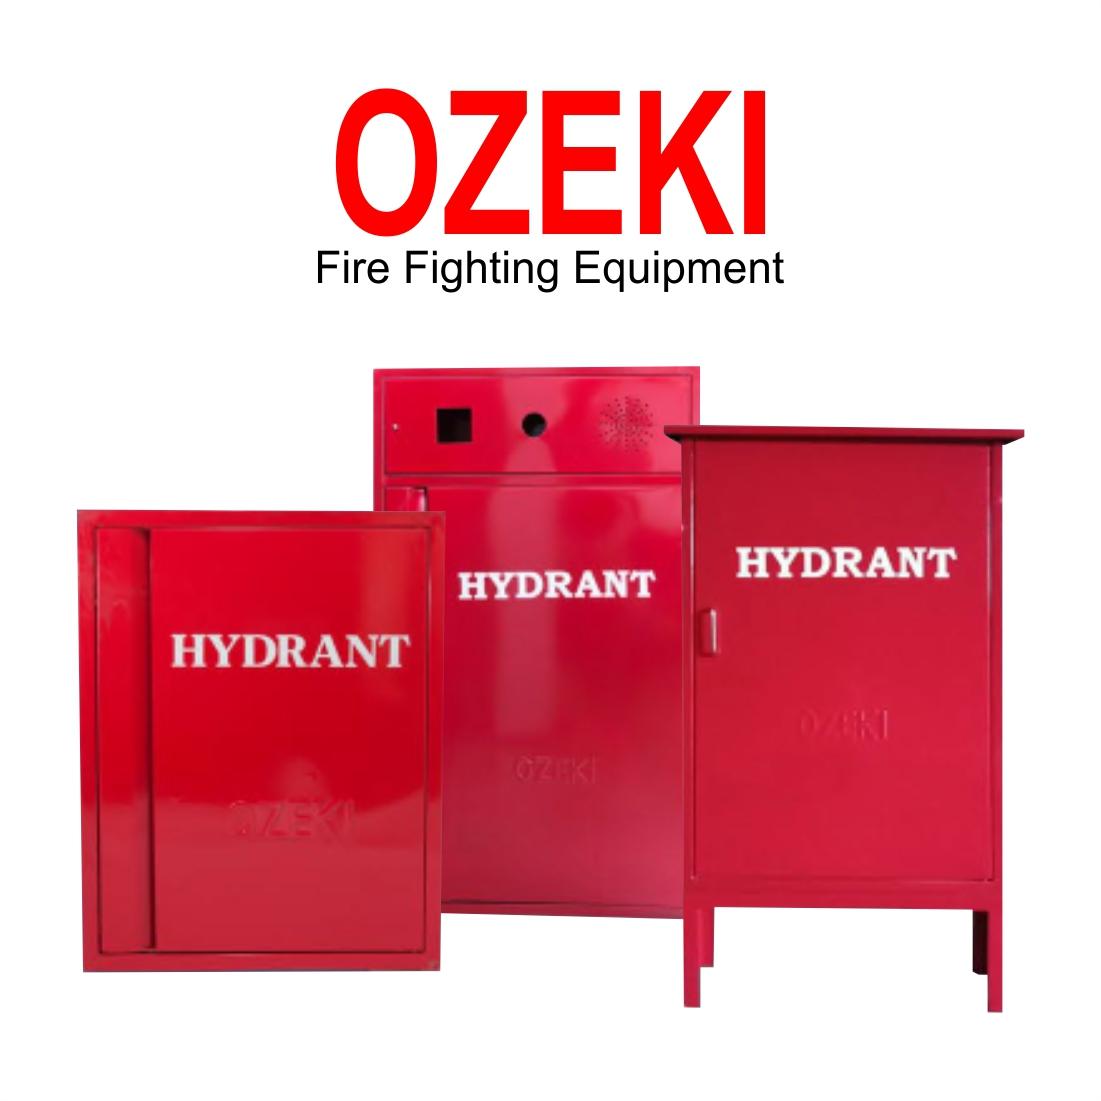 Jual Box Hydrant Ozeki